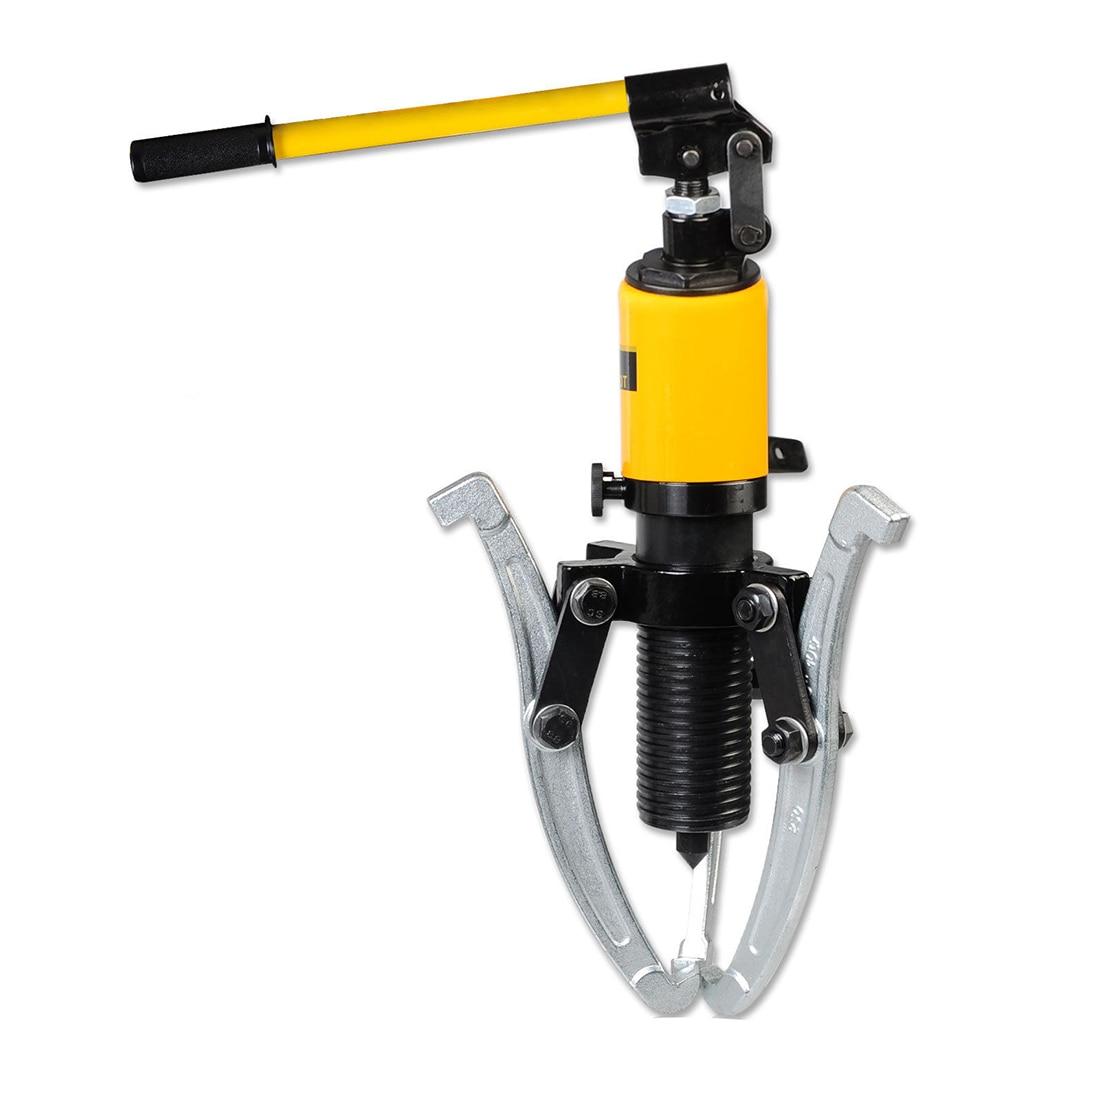 10 Ton Hydraulic Puller Bearing Hub Separator Garage Tool Set Kit general hydraulic lietex 500x800x80 ral9016 10